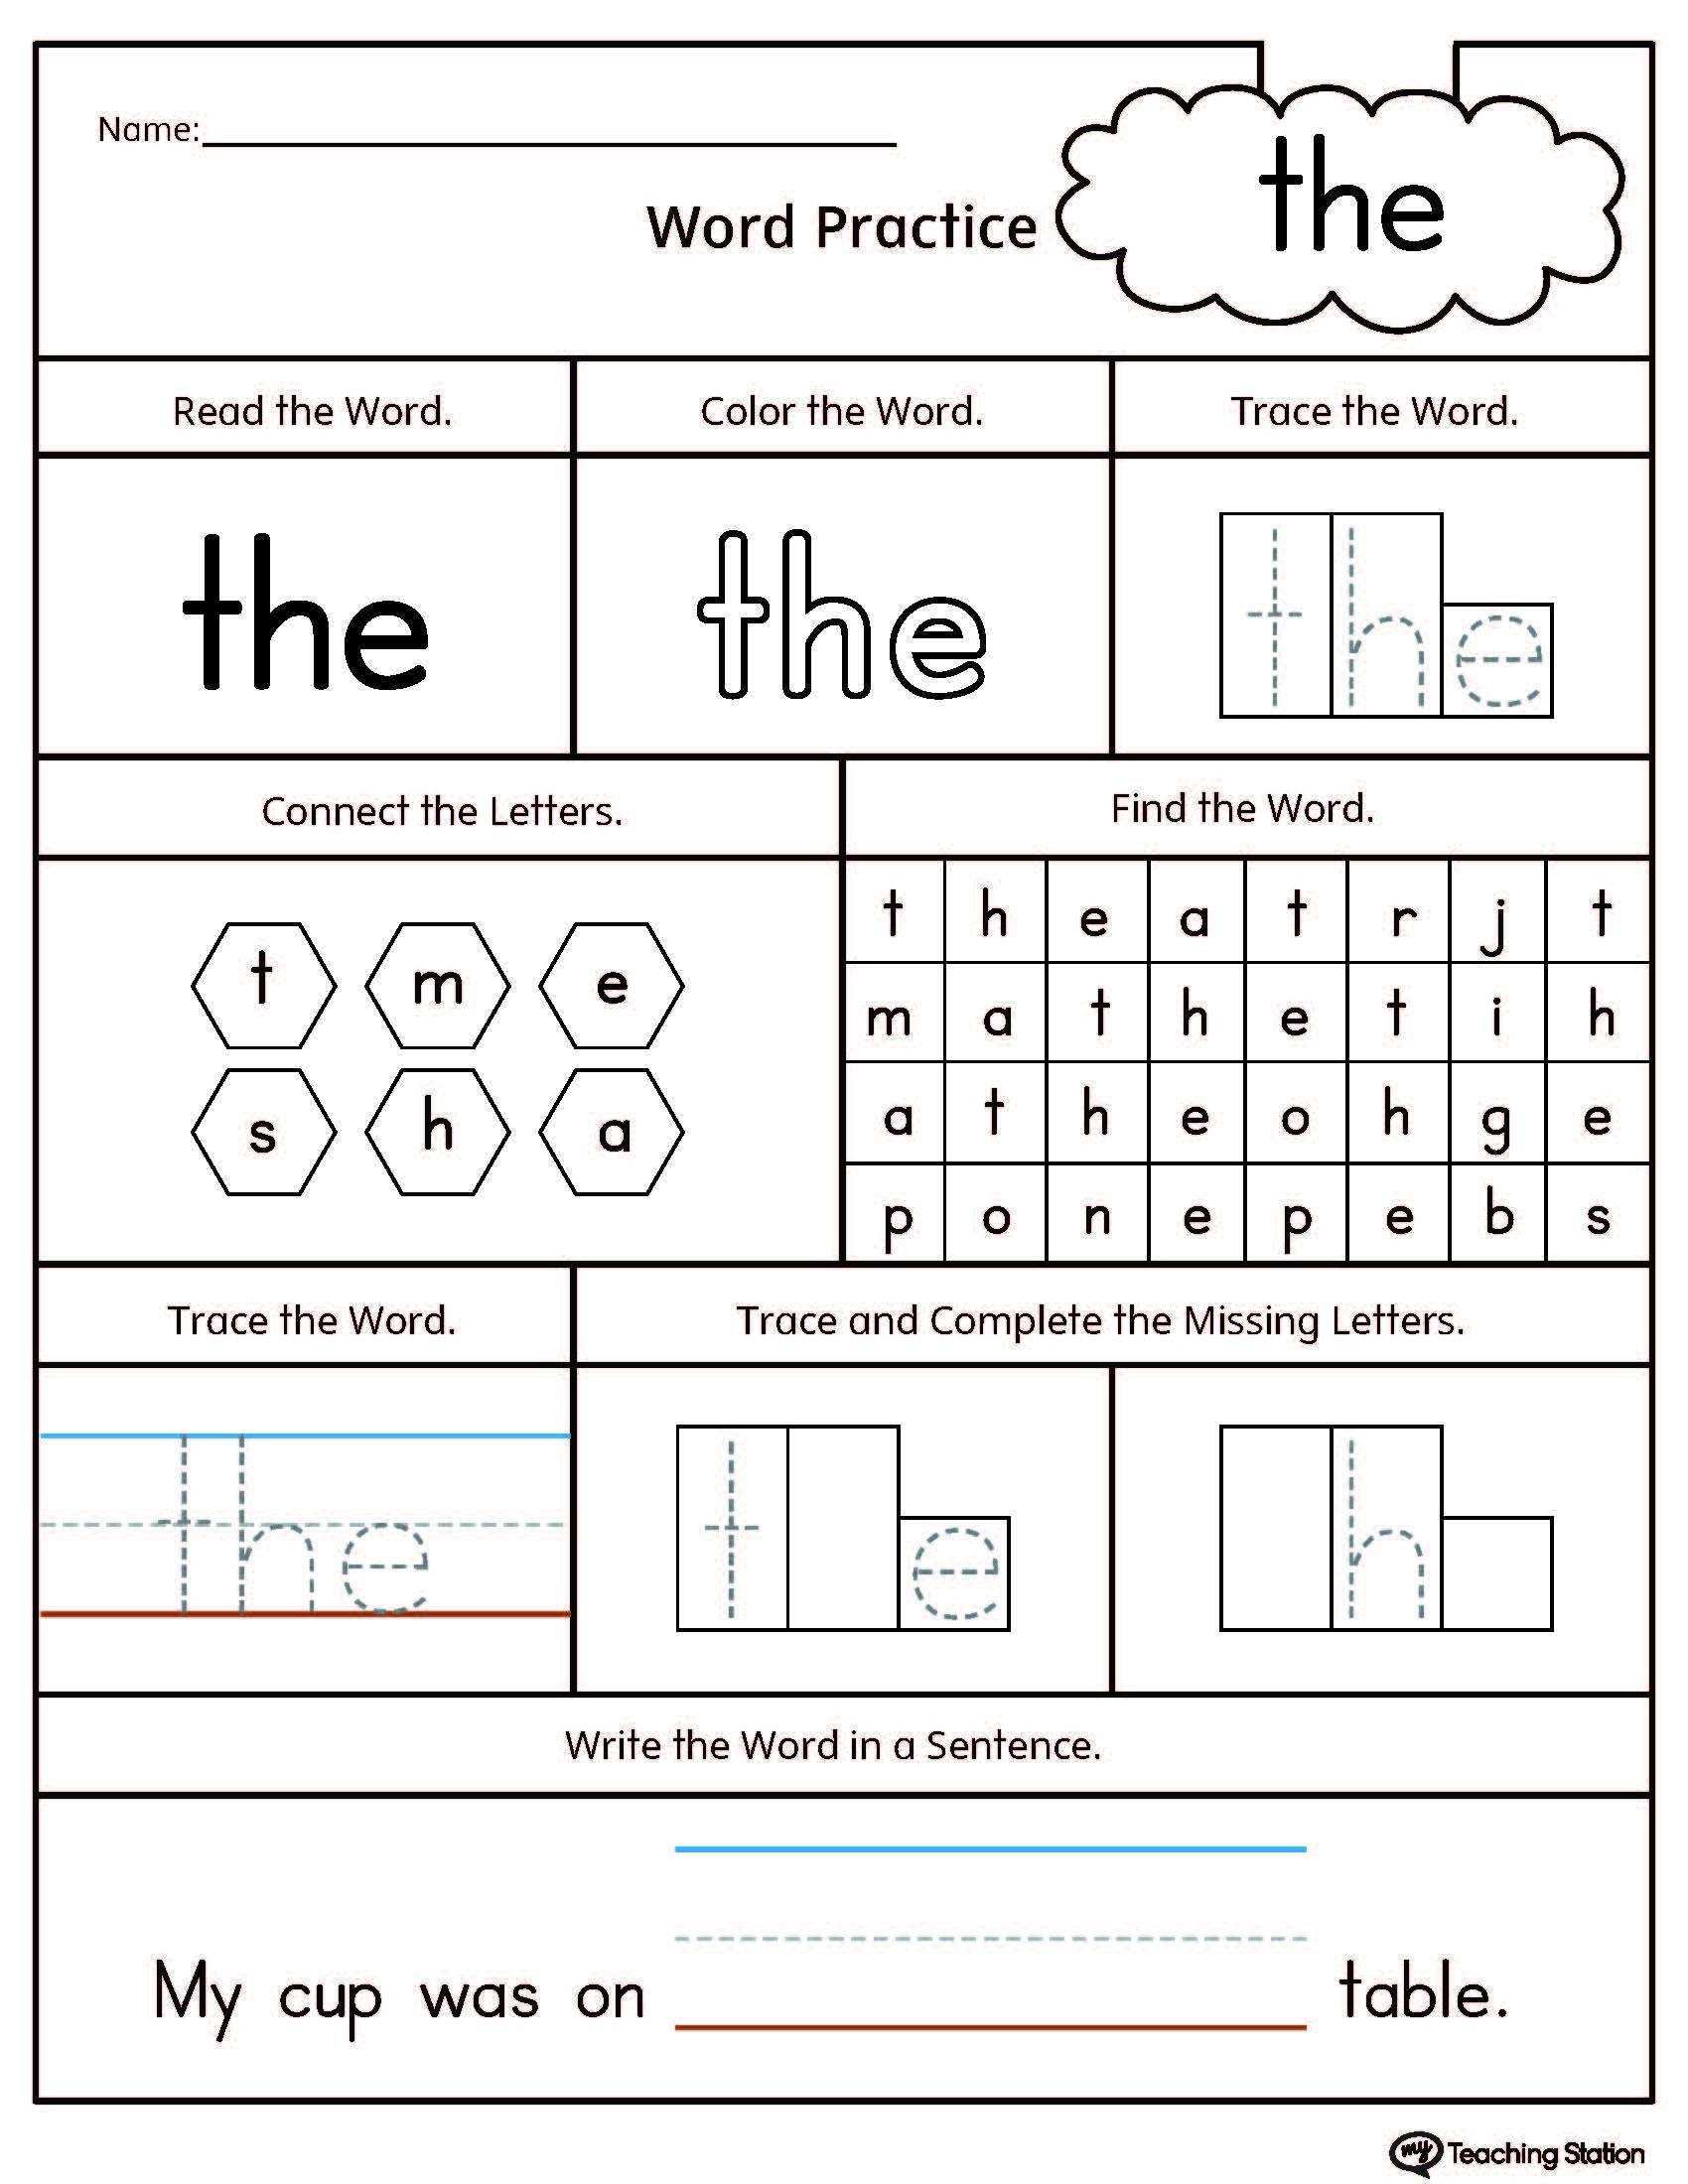 Sight Word The Printable Worksheet | Myteachingstation - Free Printable Sight Word Worksheets